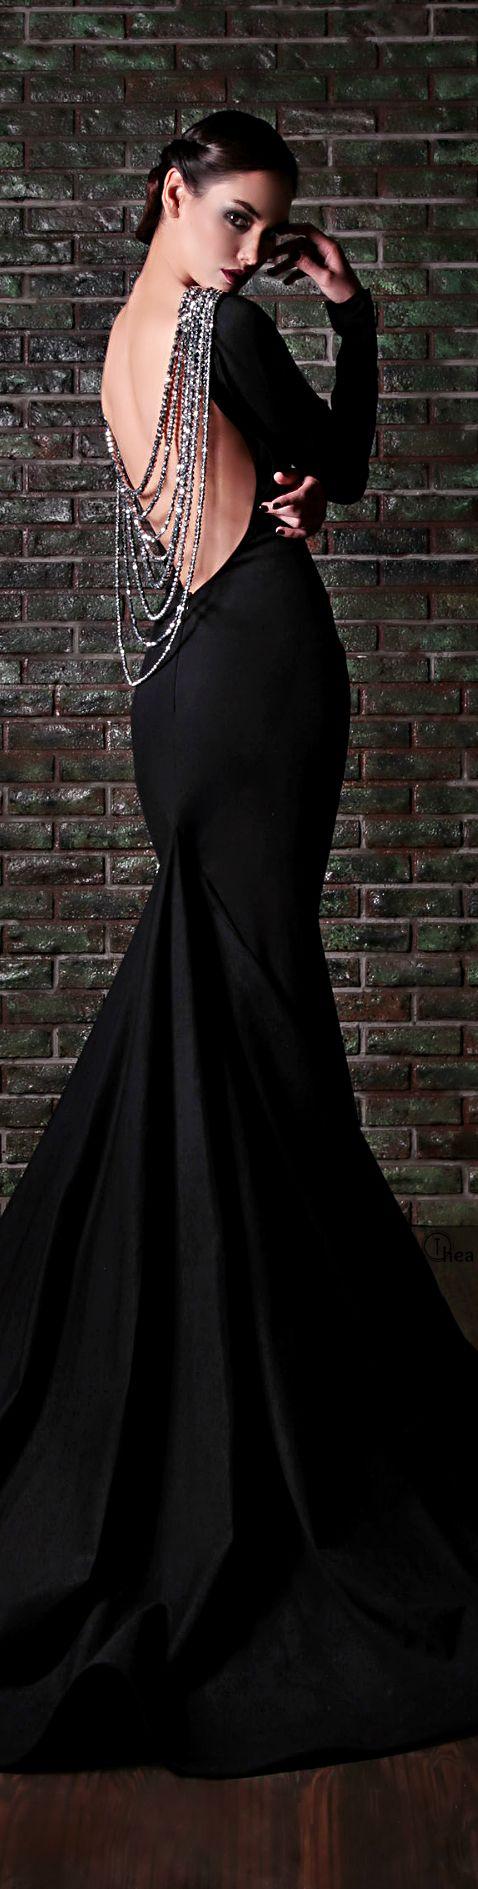 most beautiful long black dresses from rami kadi click to see